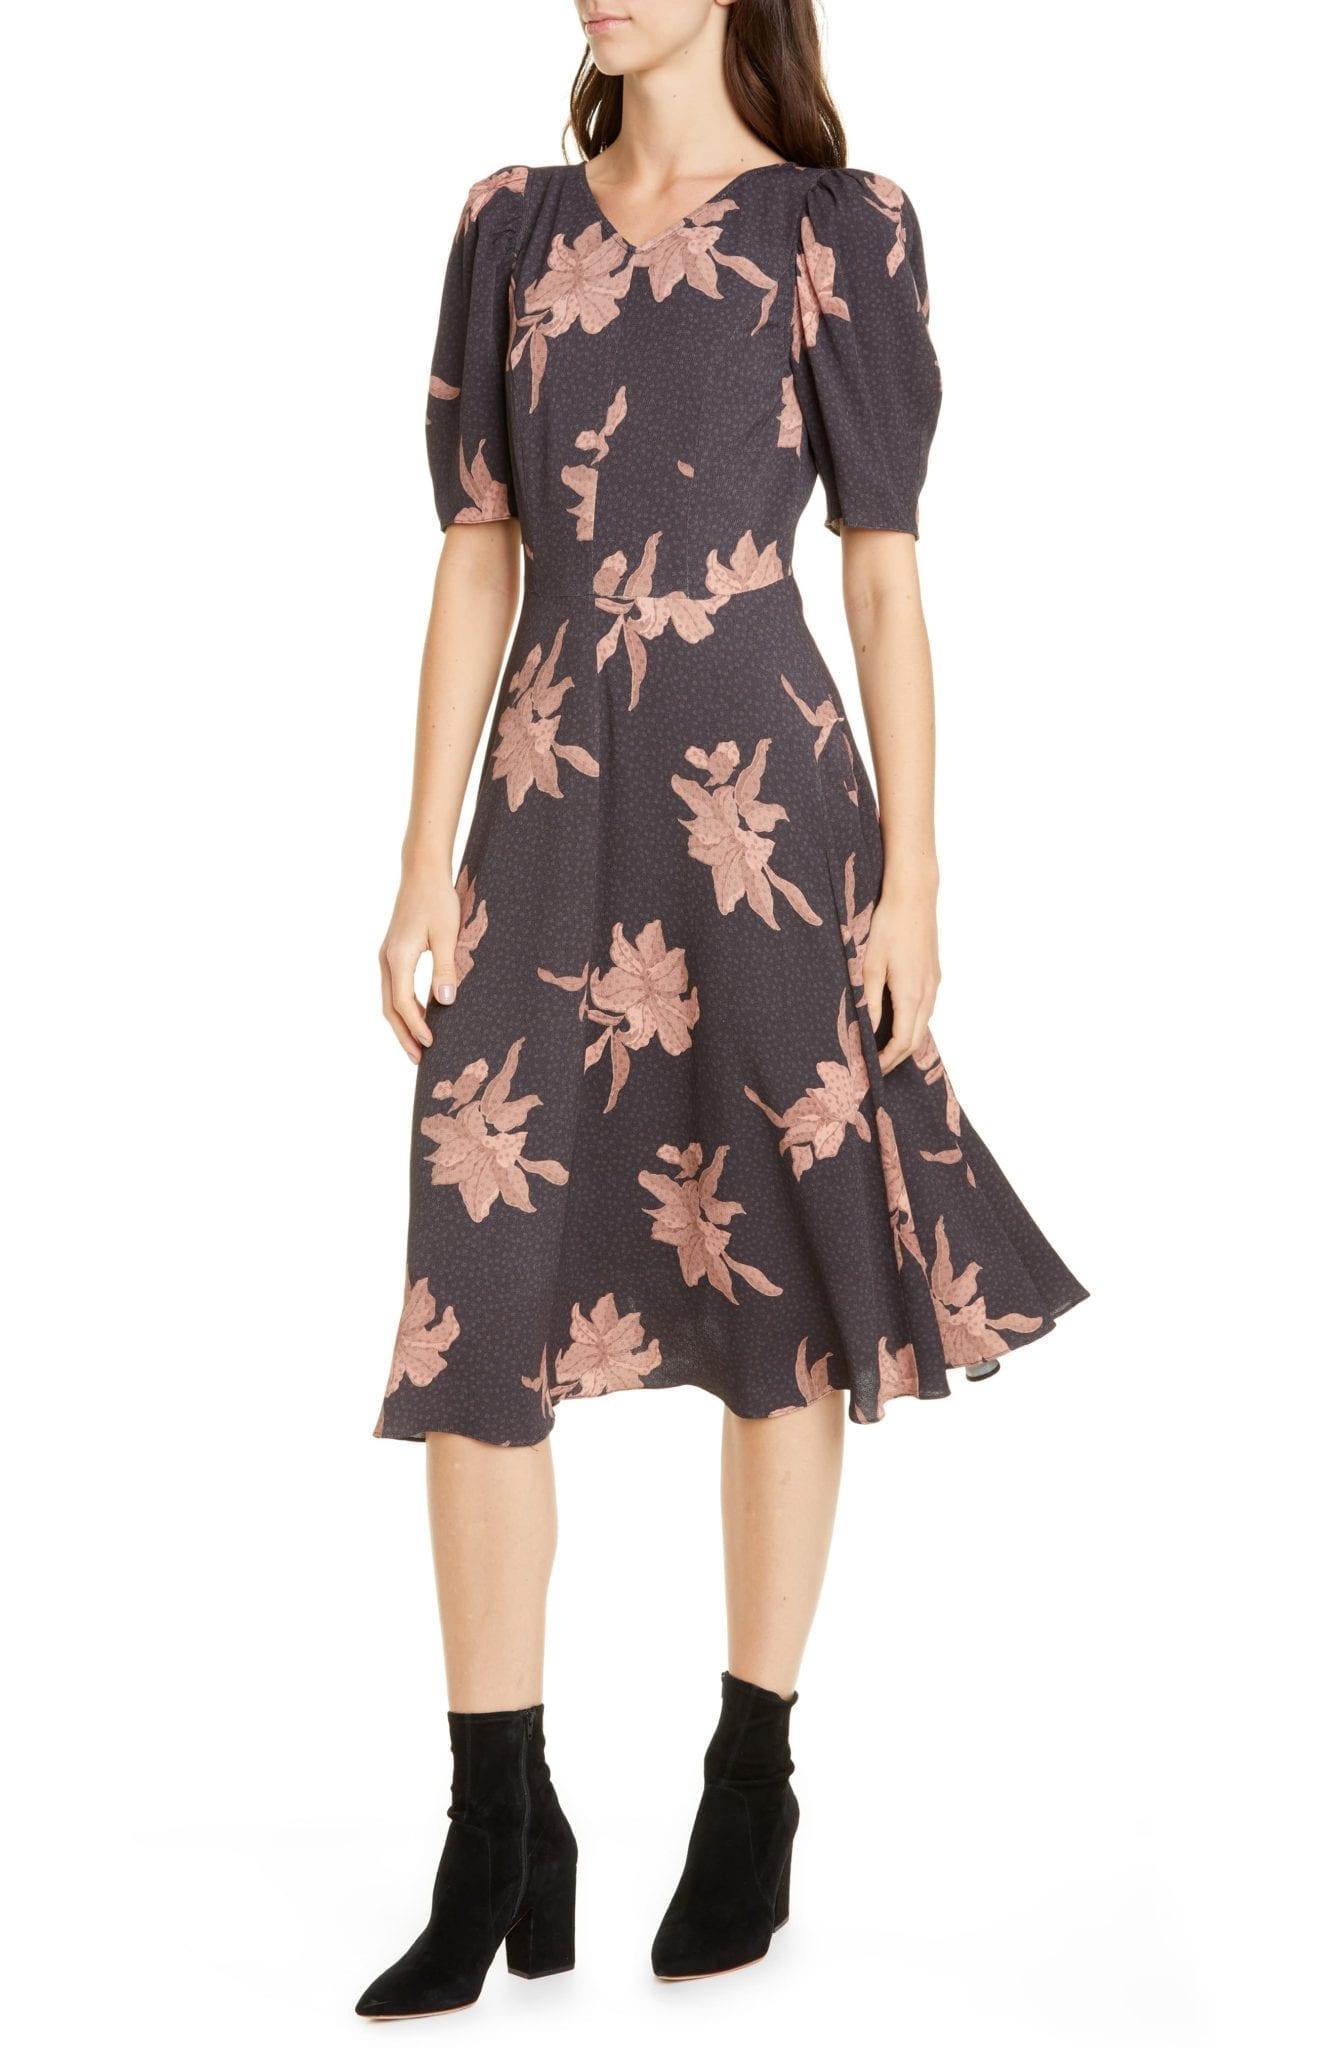 LA VIE REBECCA TAYLOR Tiger Lily Puff Sleeve Dress